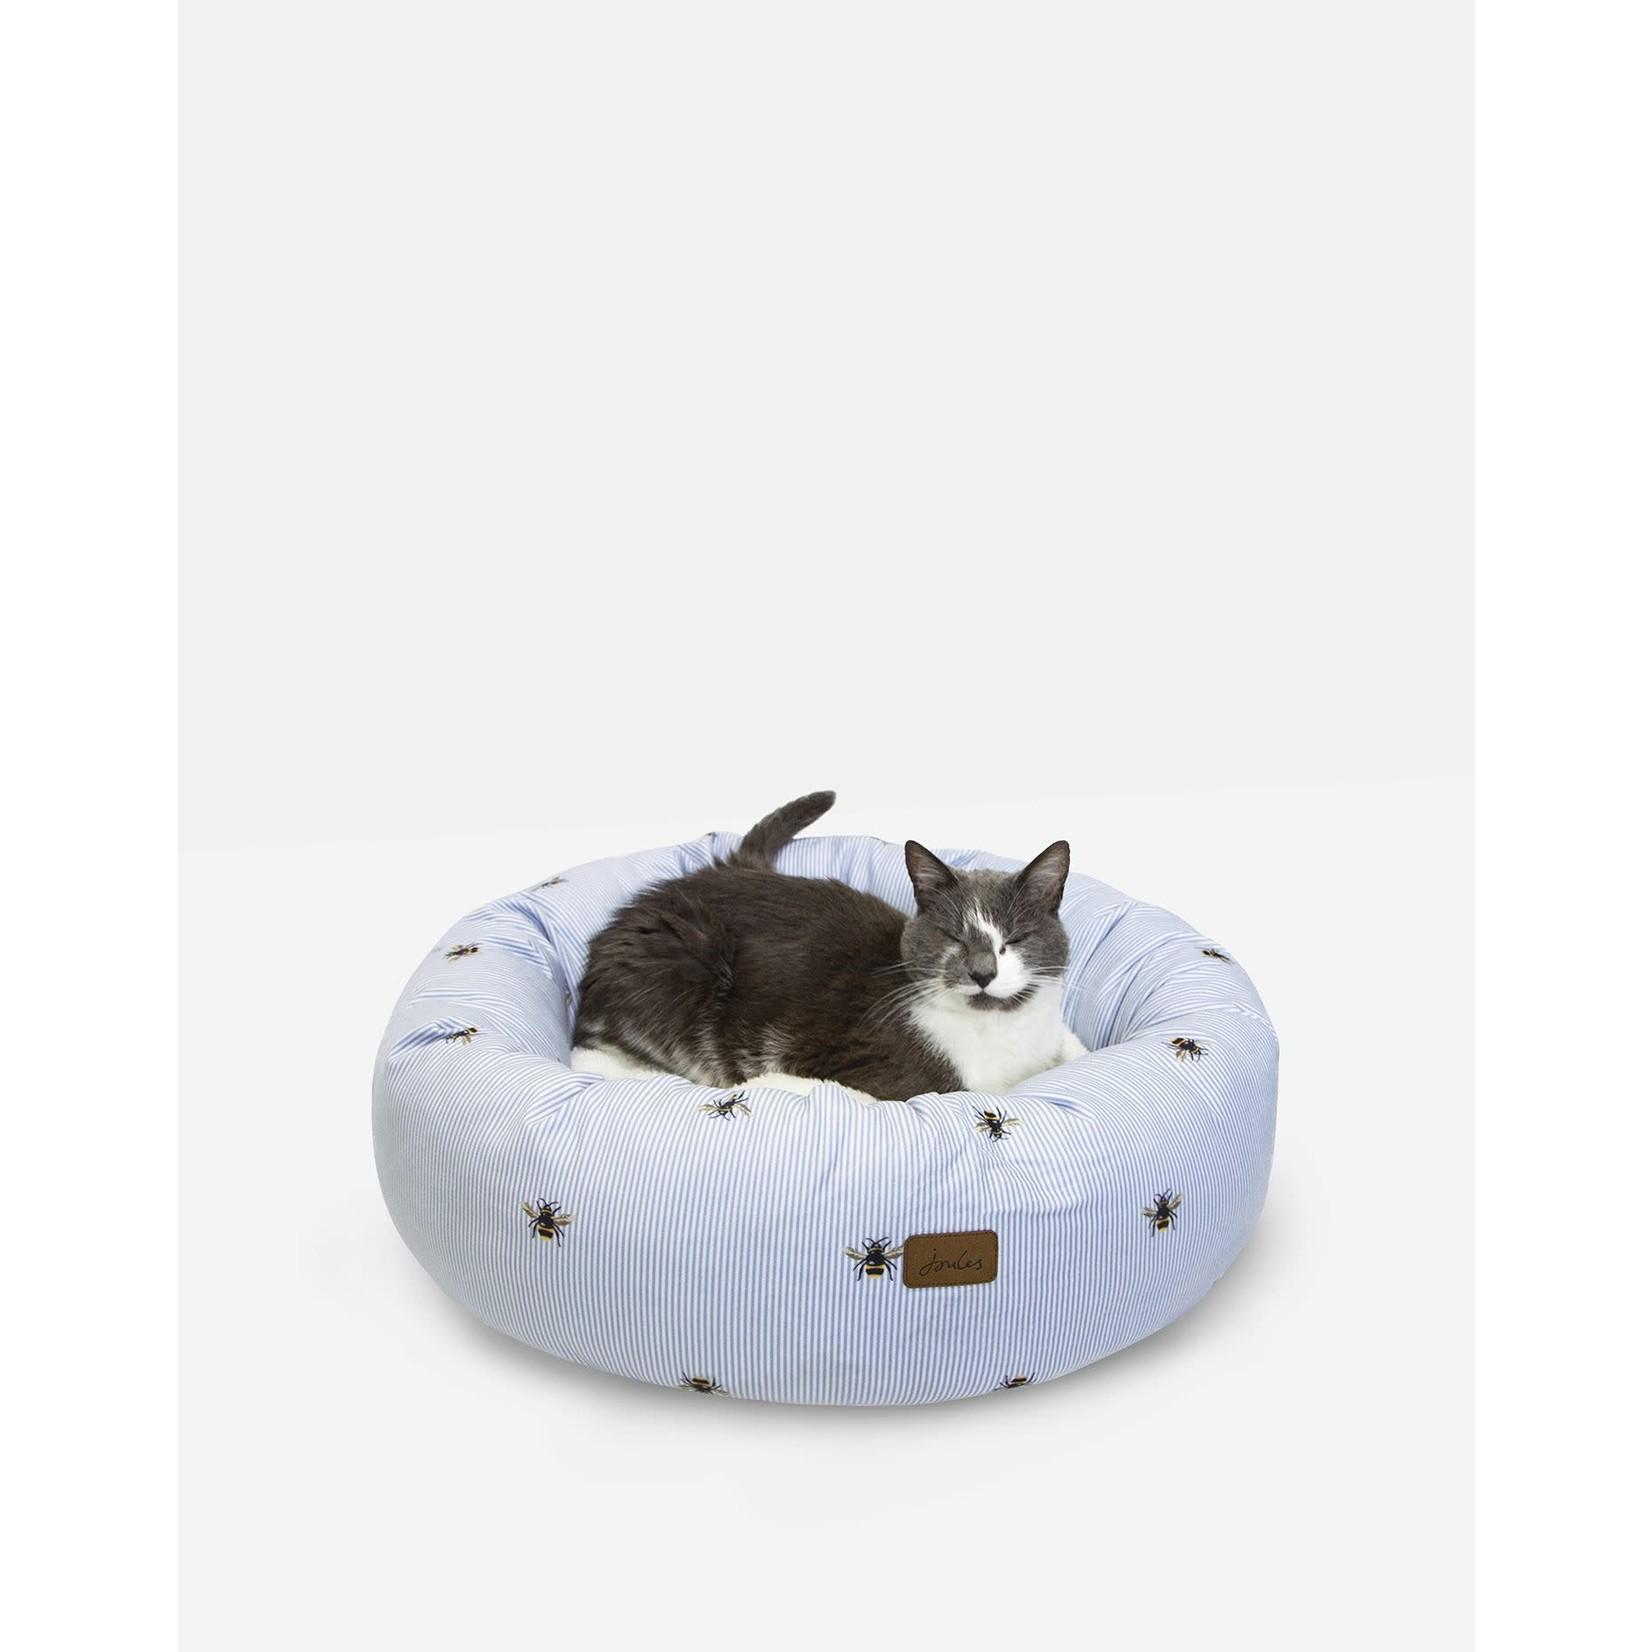 Joules Bee Print Doughnut Cat & Dog Bed, 58cm